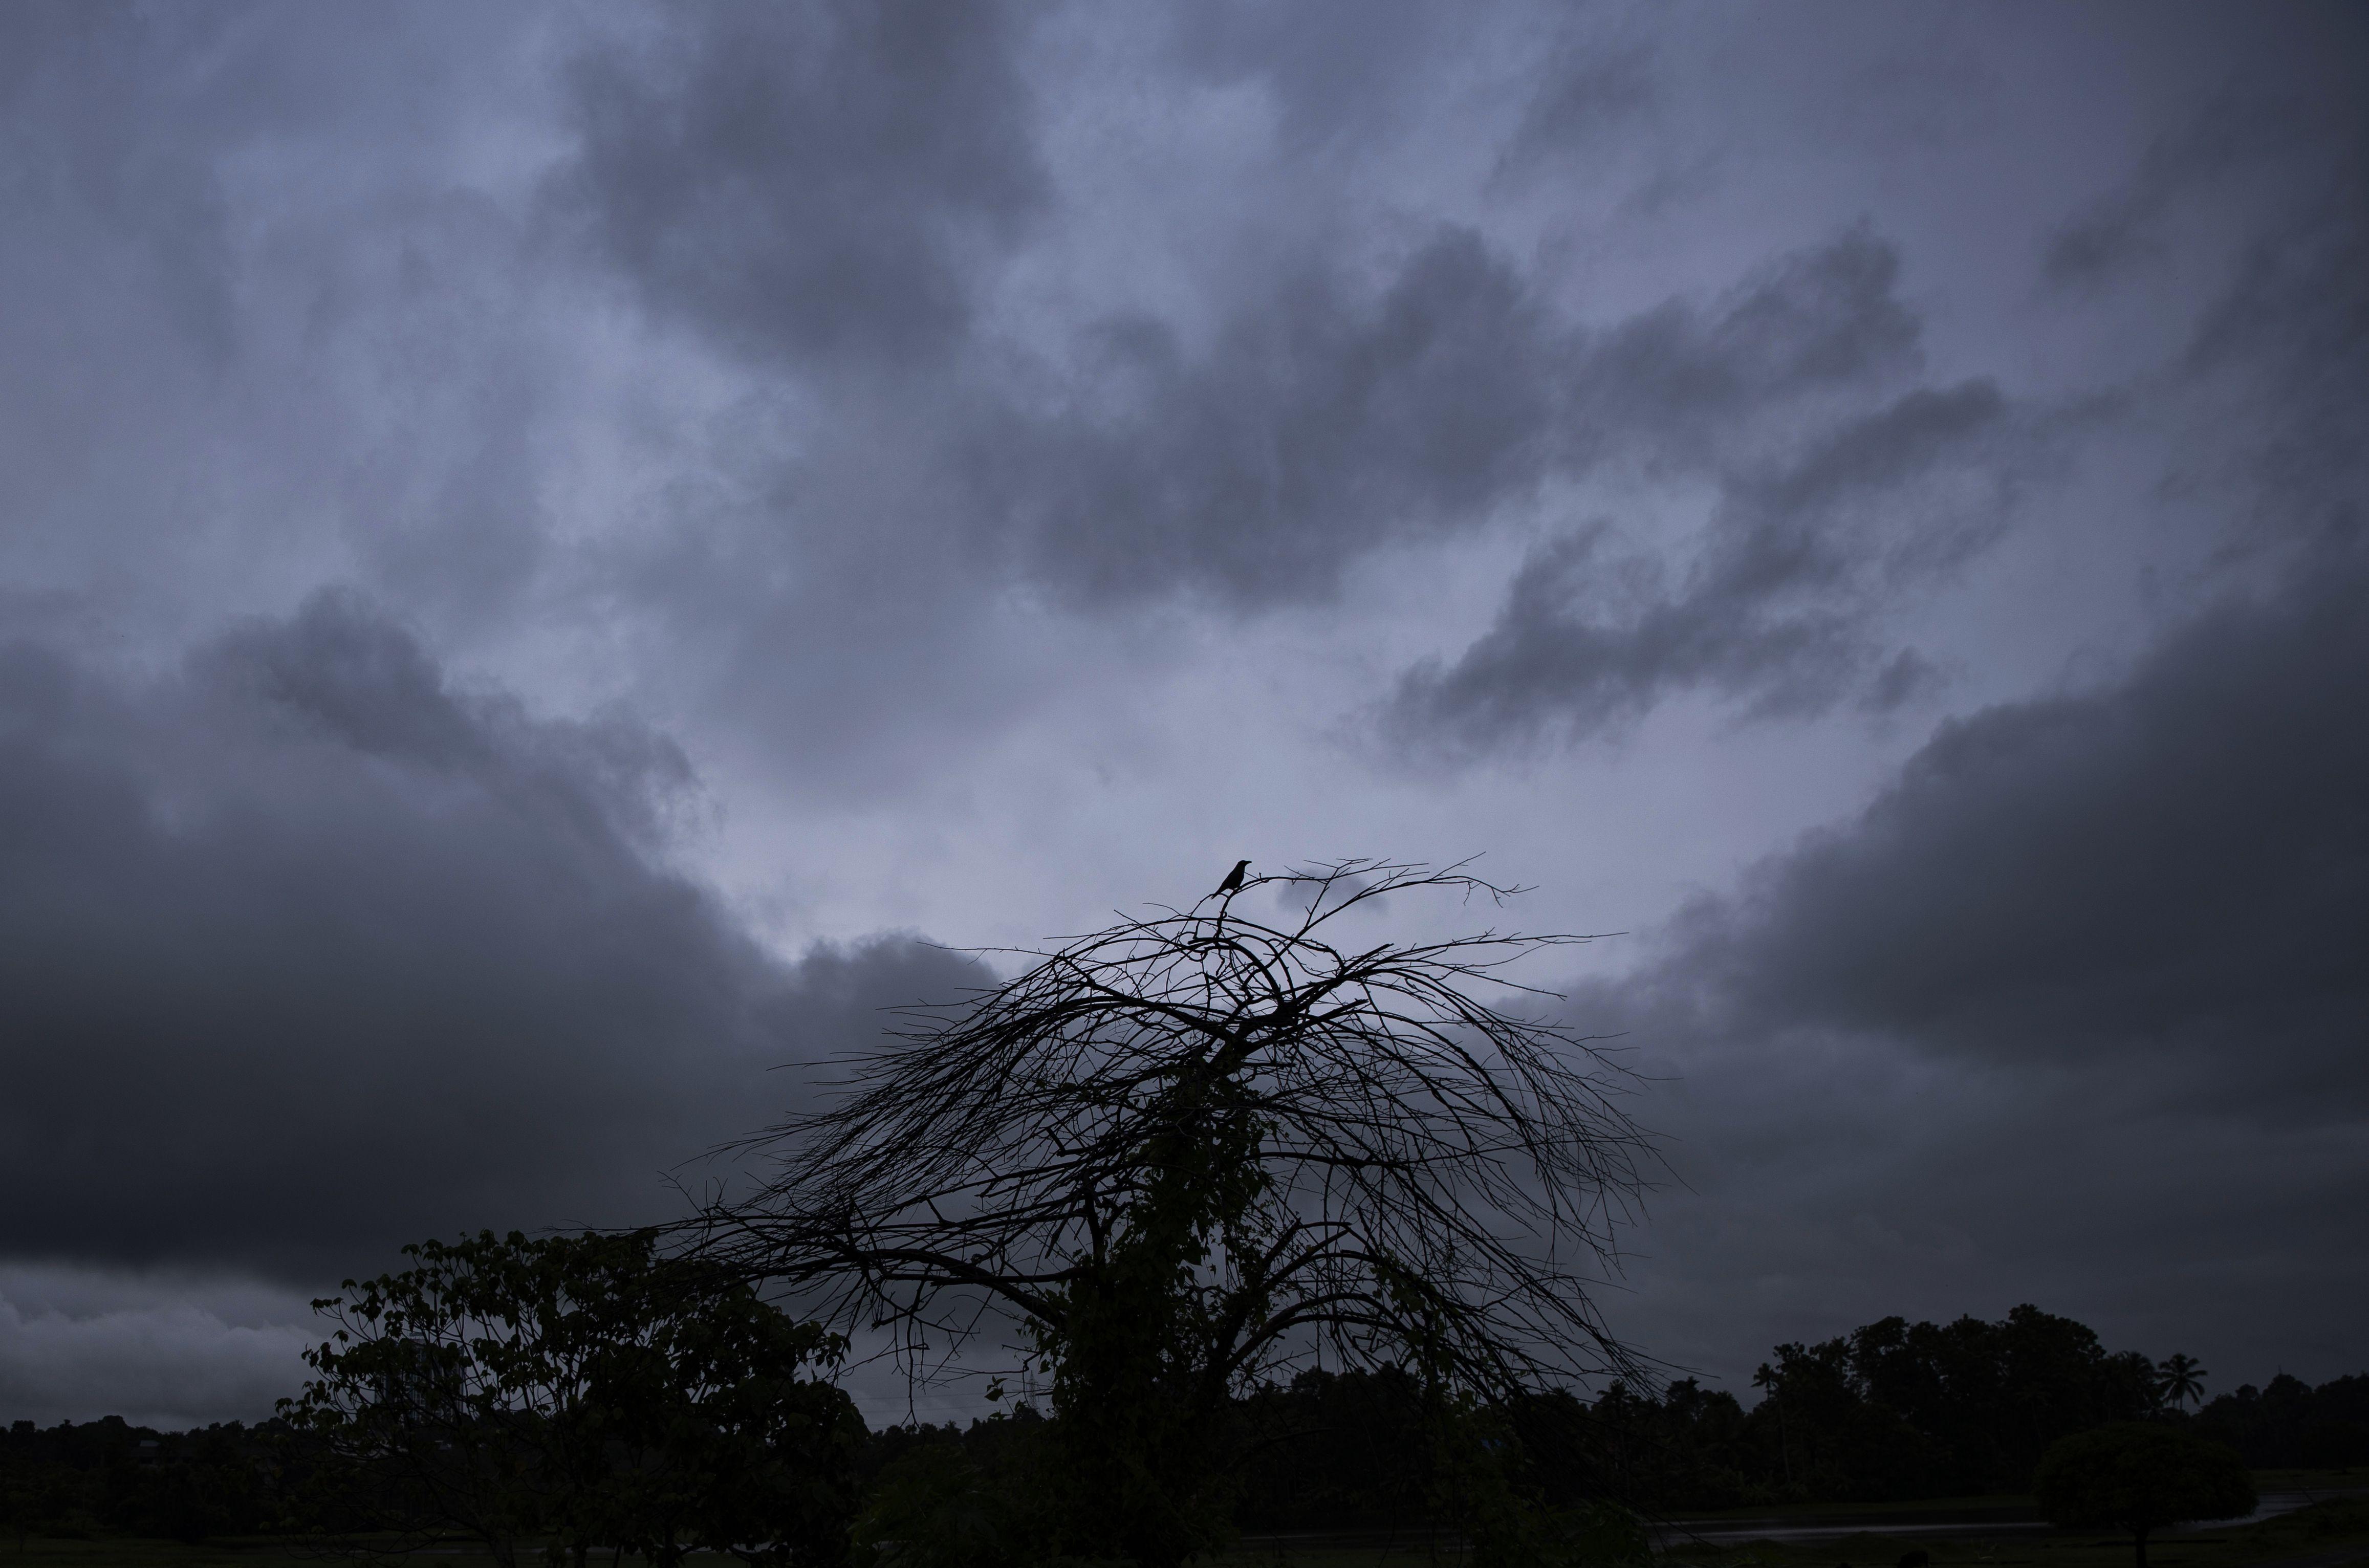 india: 8 muertos, 12 desaparecidos por lluvia e inundaciones